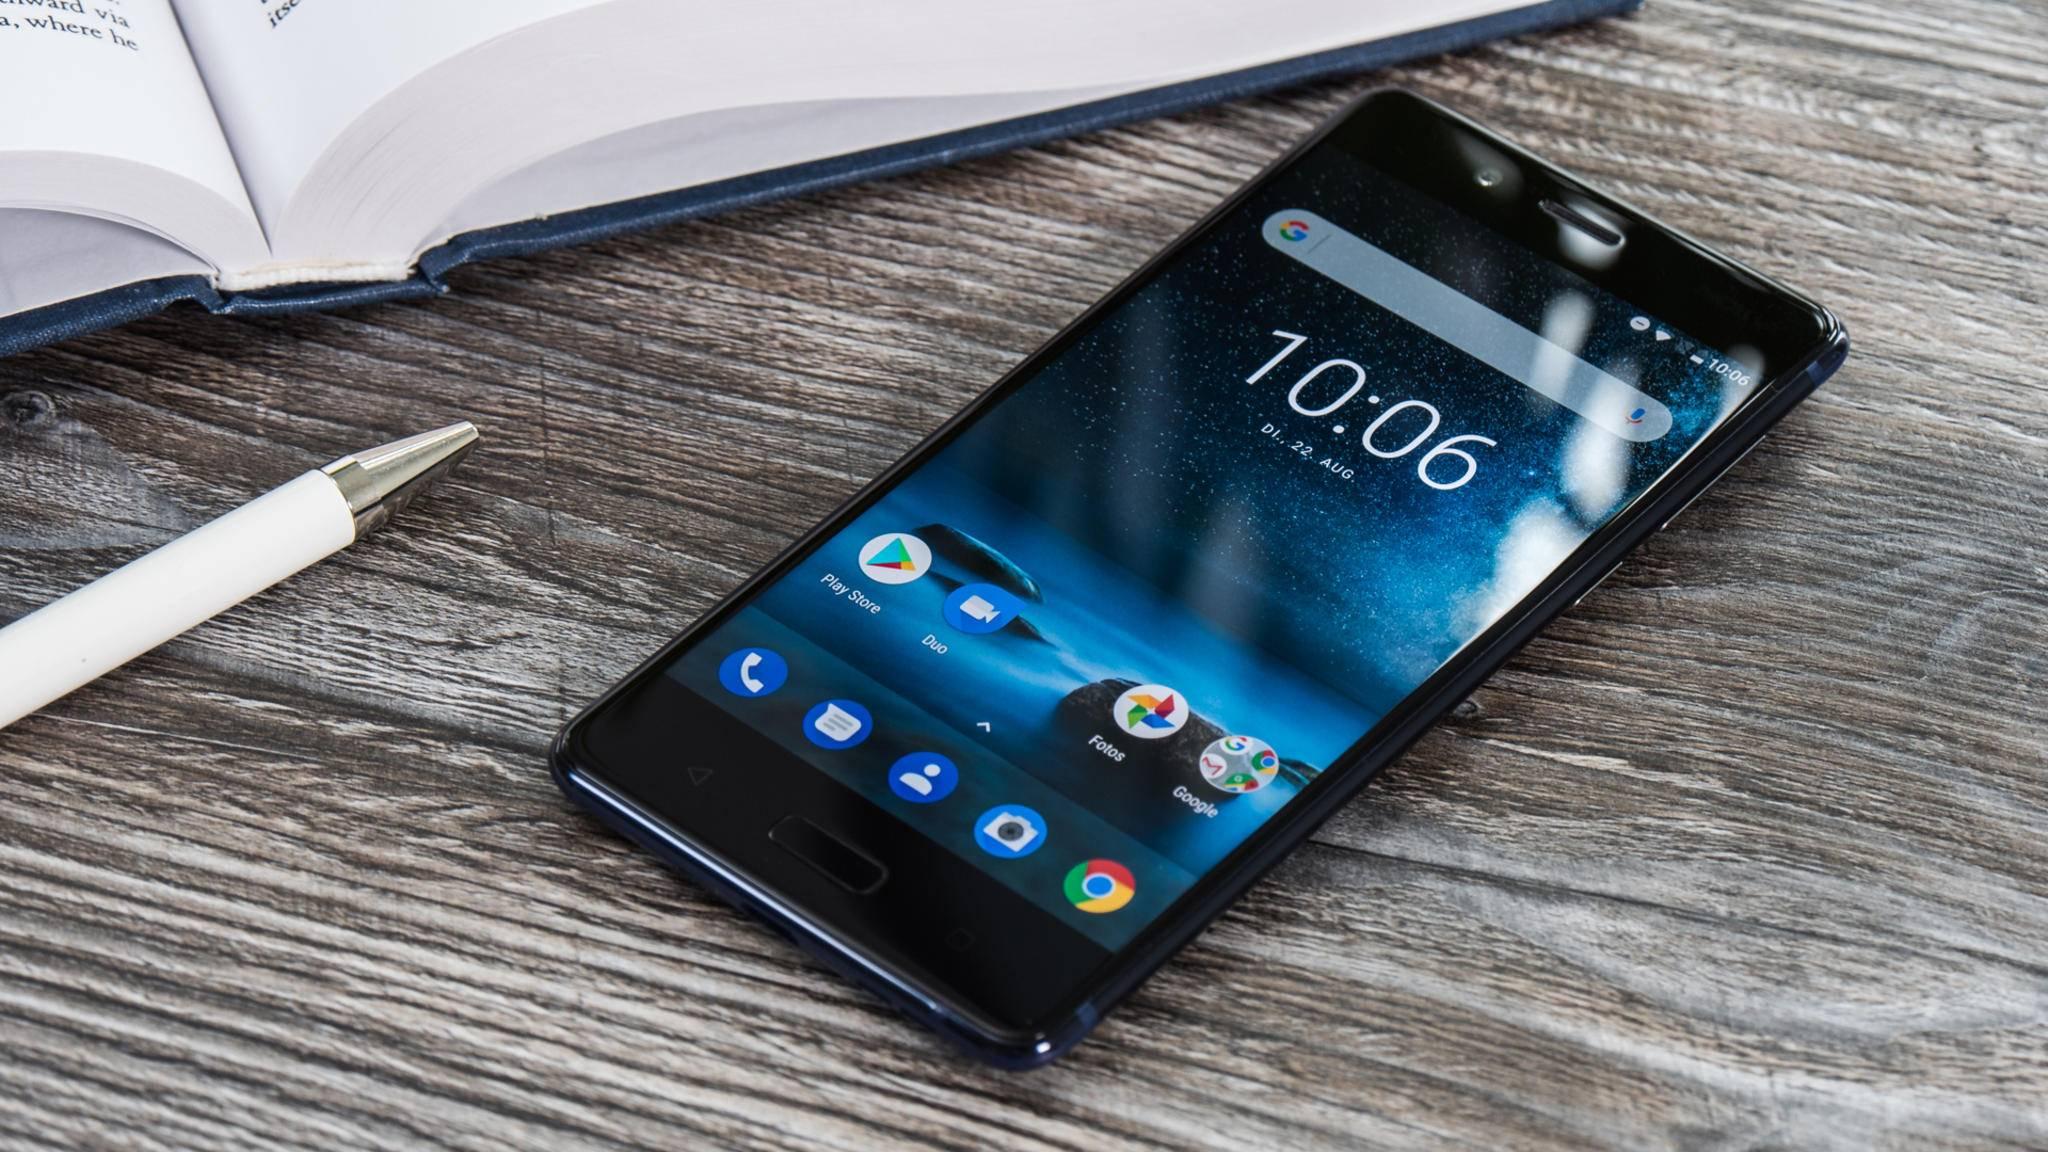 Das Nokia 8 ist ein aktuelles Flaggschiff mit Stock Android.